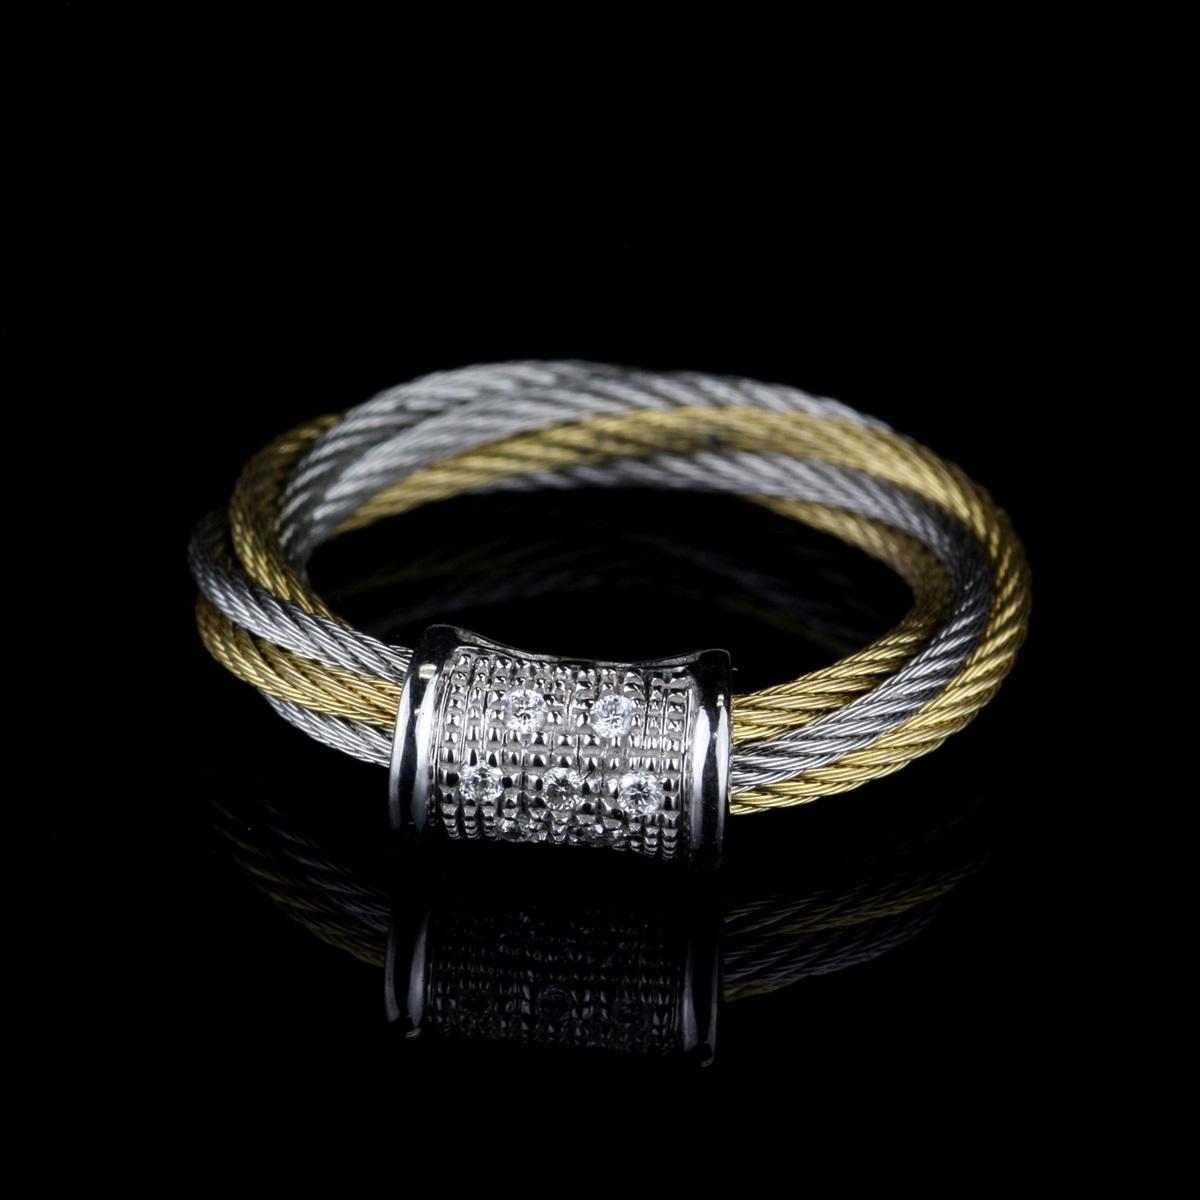 Swiss Manufacturer Of Luxury Watches